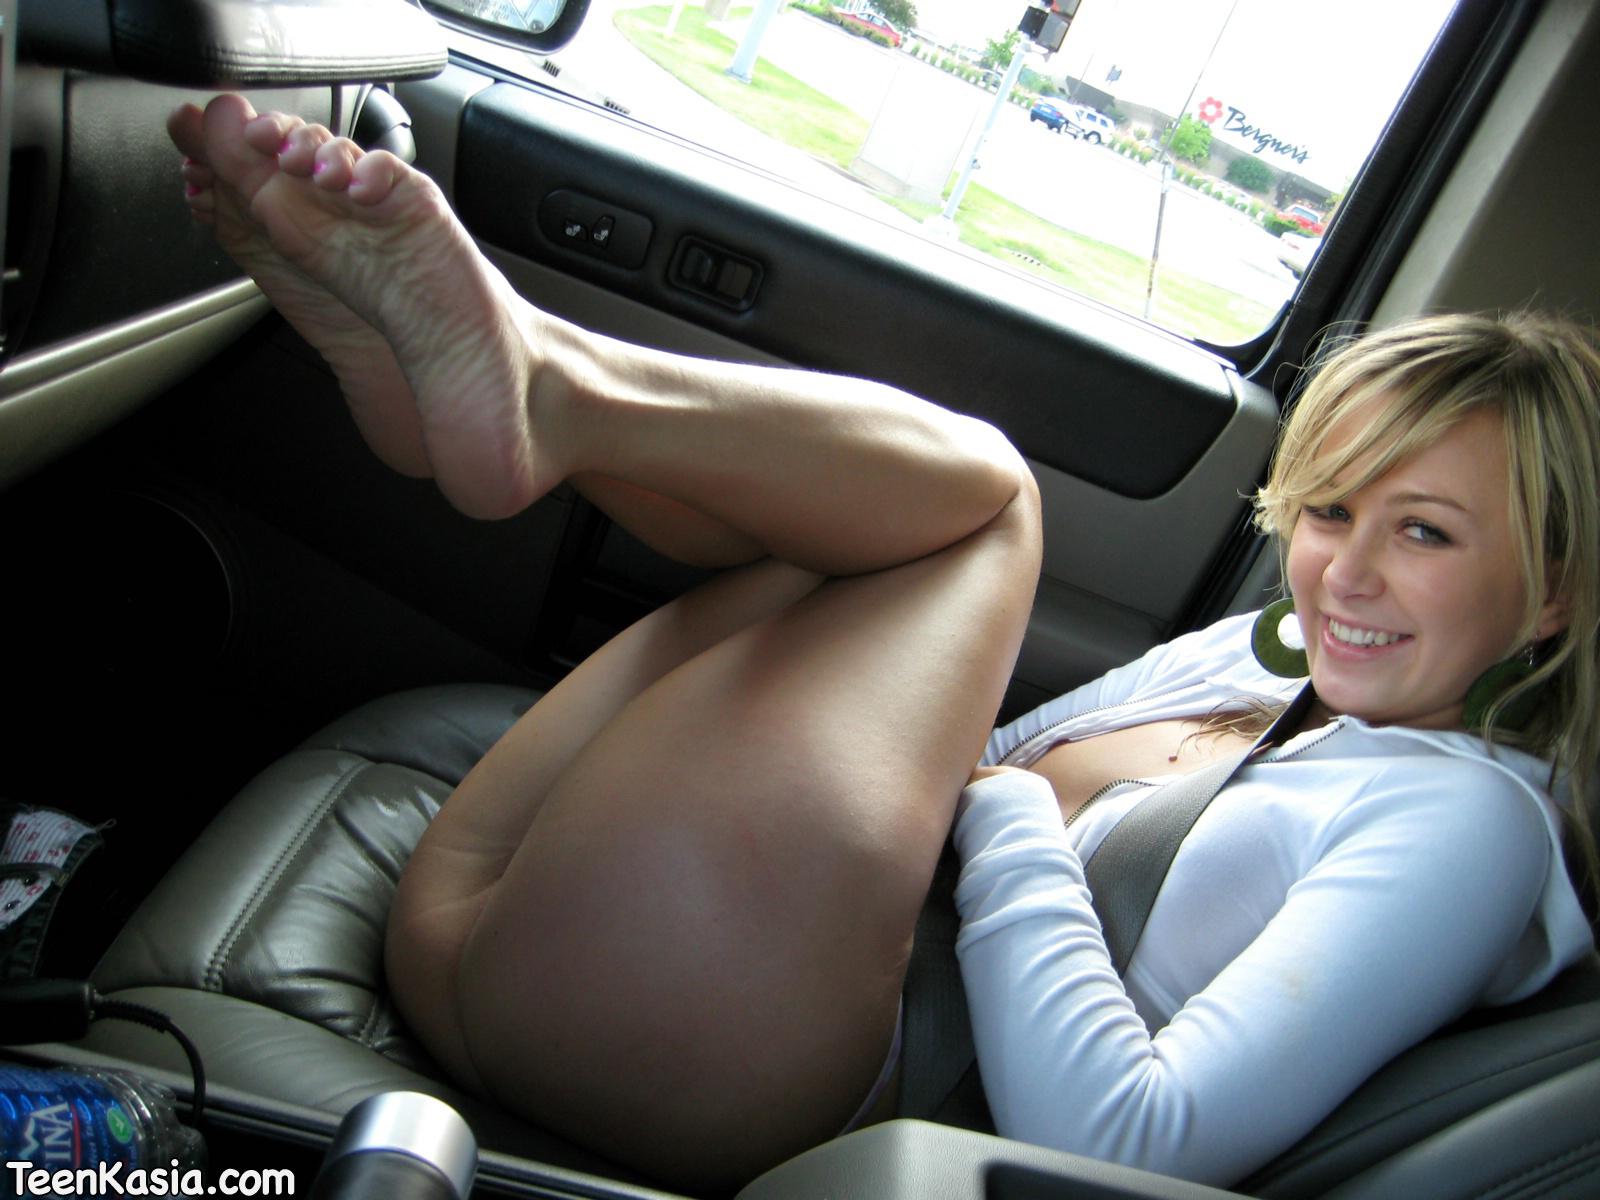 Women wash car naked